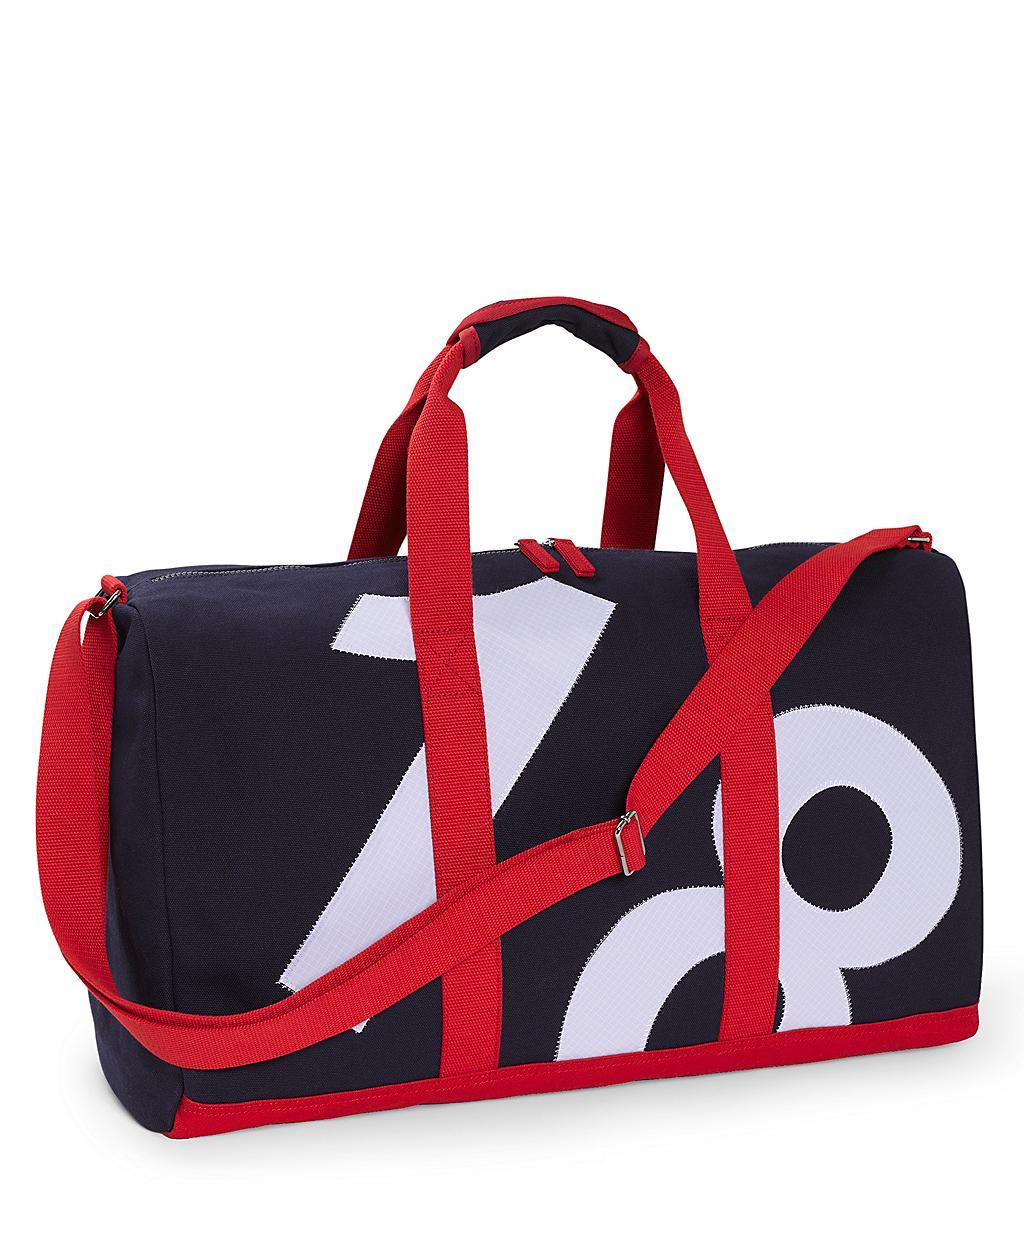 In  Duffle Bag Insider Travel